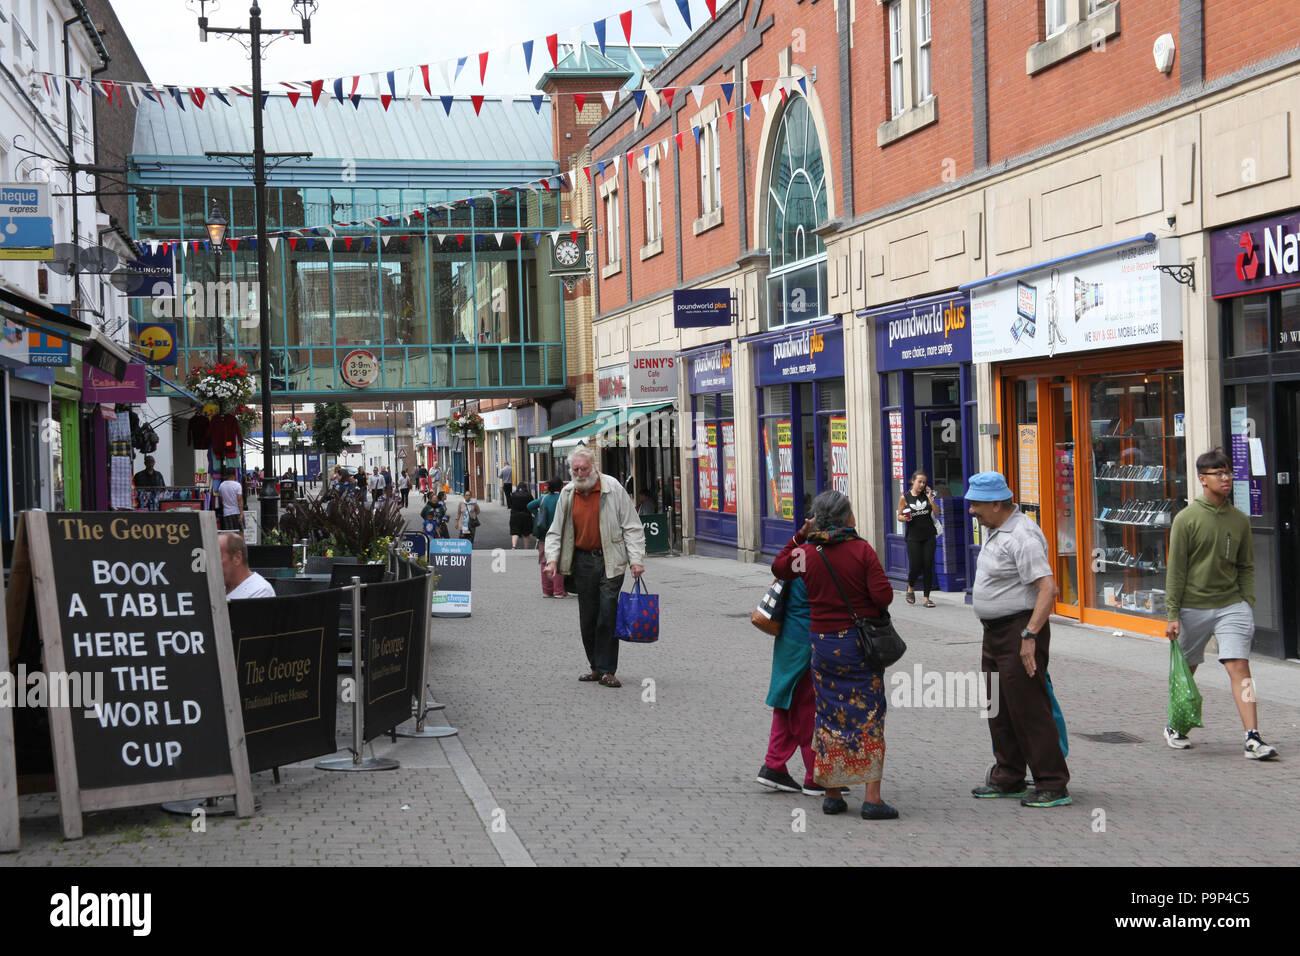 A shopping precinct in Aldershot, UK. - Stock Image